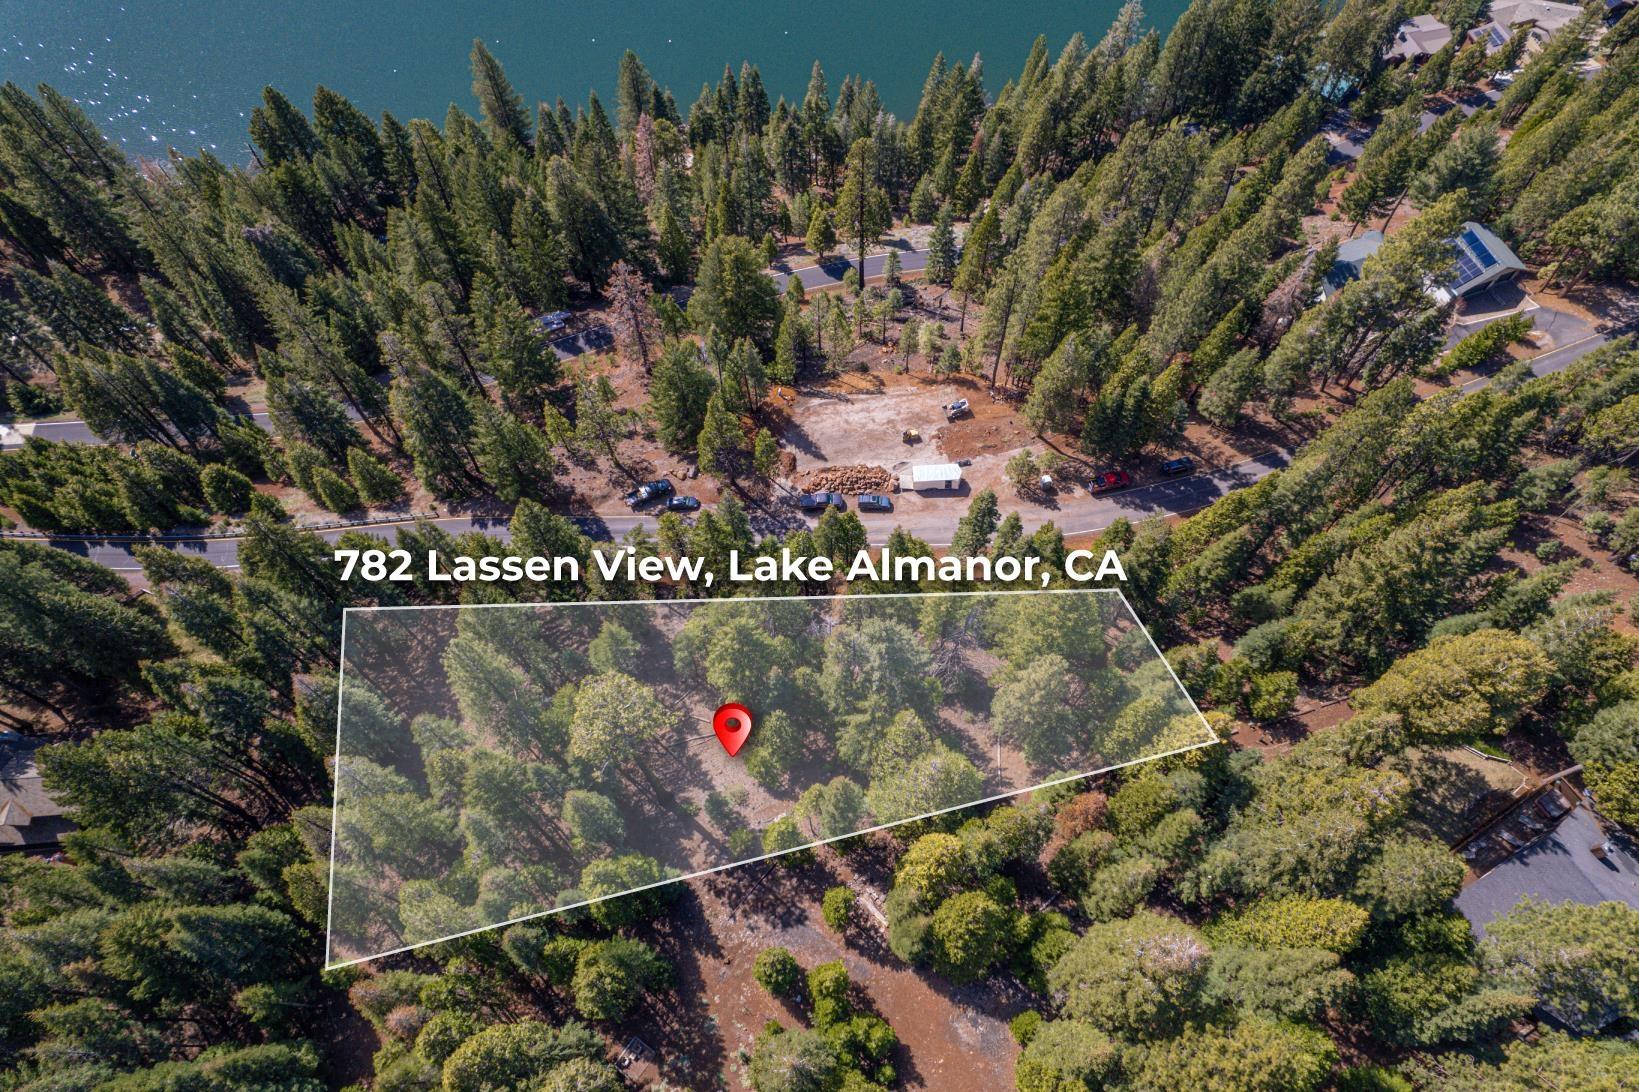 782 Lassen View Drive, Lake Almanor, CA 96137